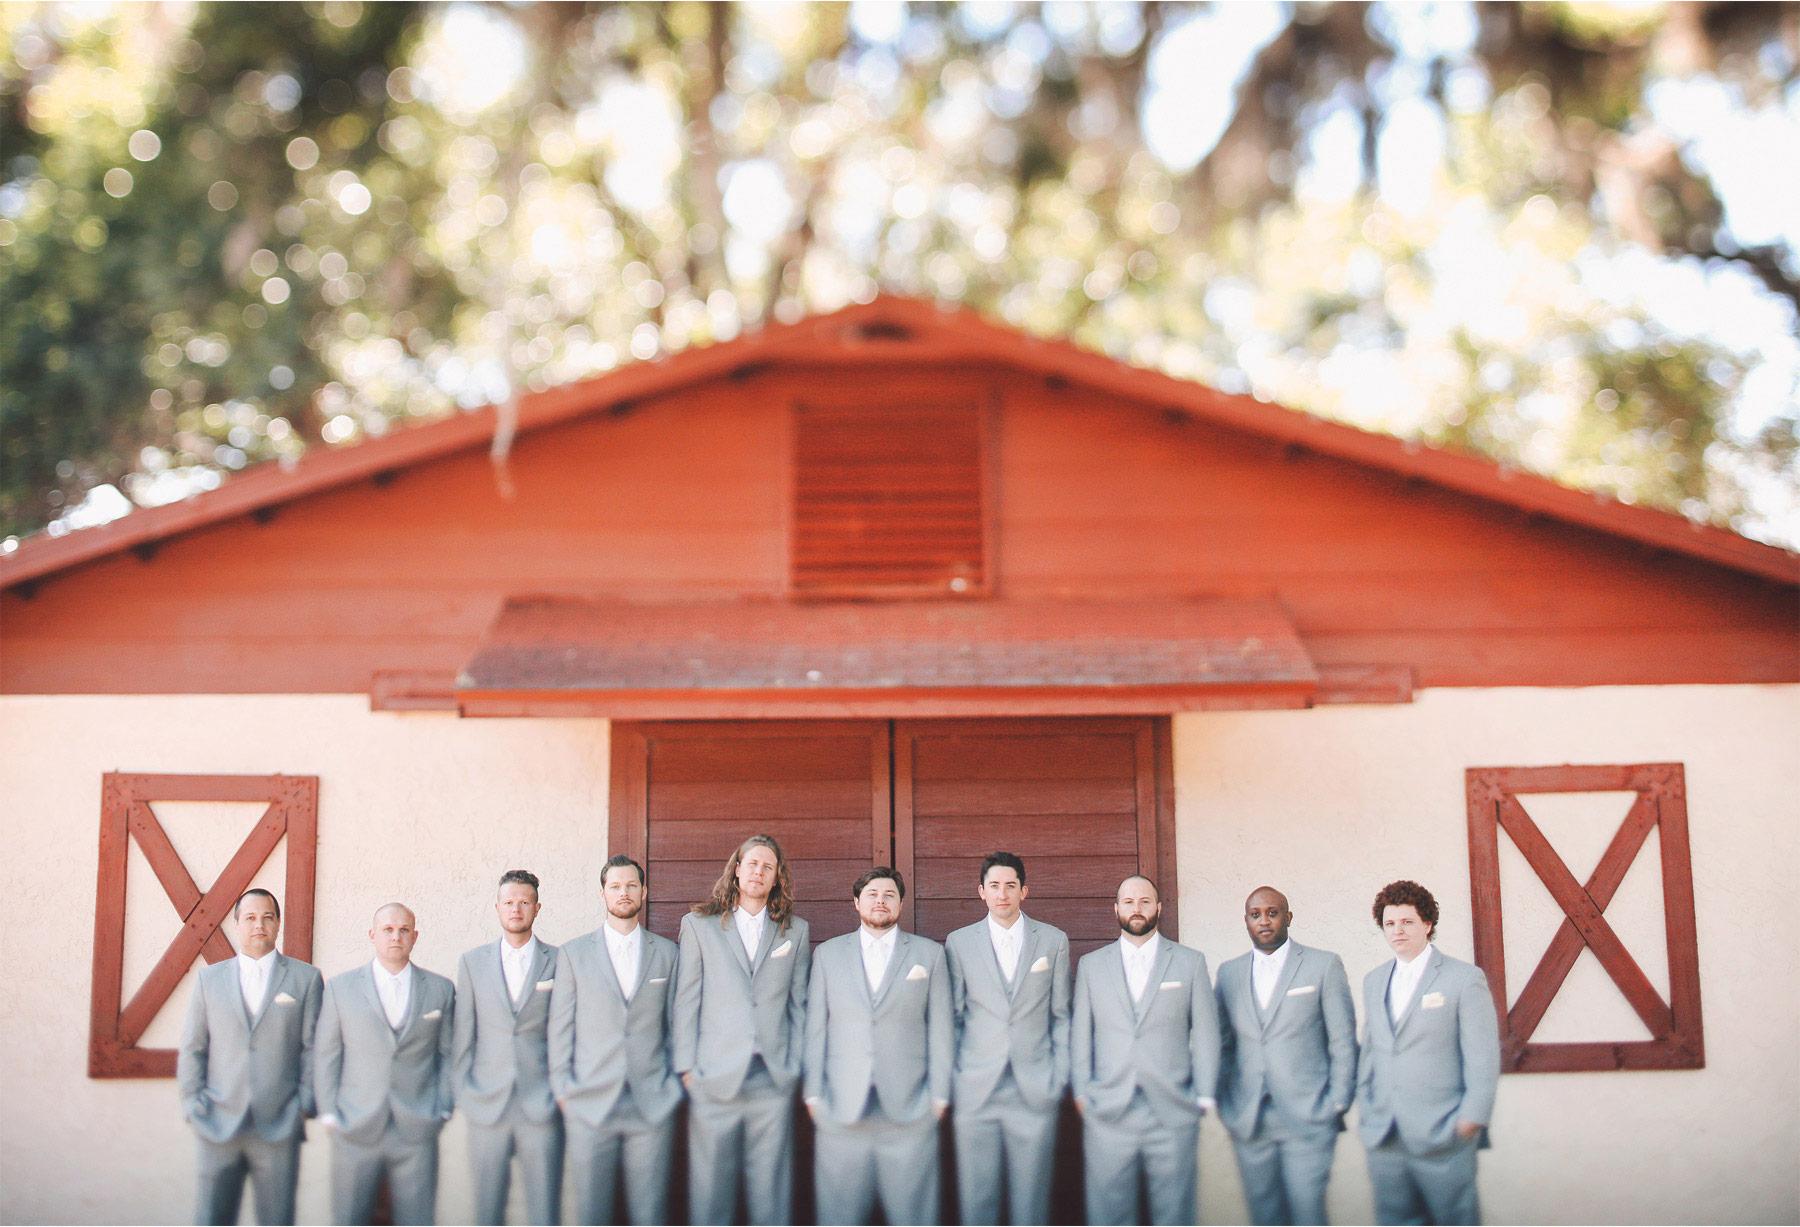 12-Brandon-Florida-Wedding-Photographer-by-Andrew-Vick-Photography-Casa-Lantana-Spring-Groom-Groomsmen-Tilt-Shift-Barn-Vintage-Kristianna-and-Ben.jpg